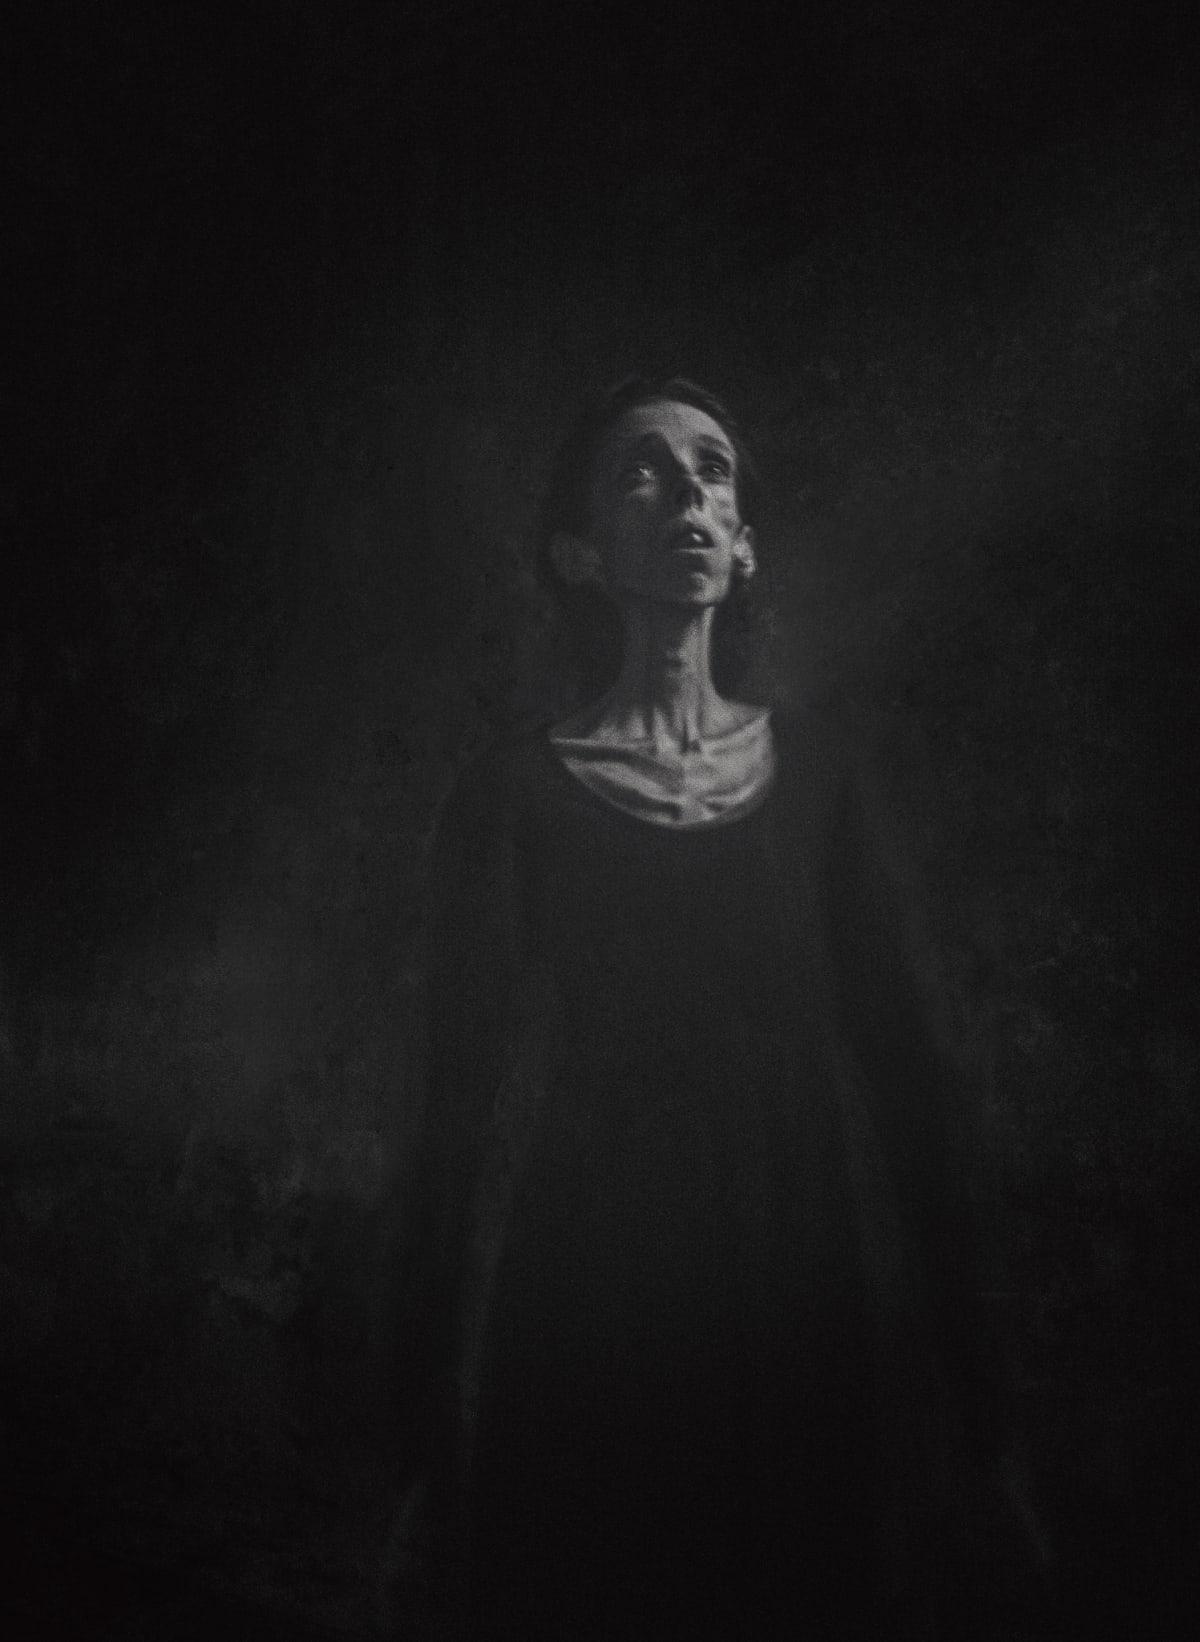 Lene Marie Fossen, Untitled Chios 1010048, 2017